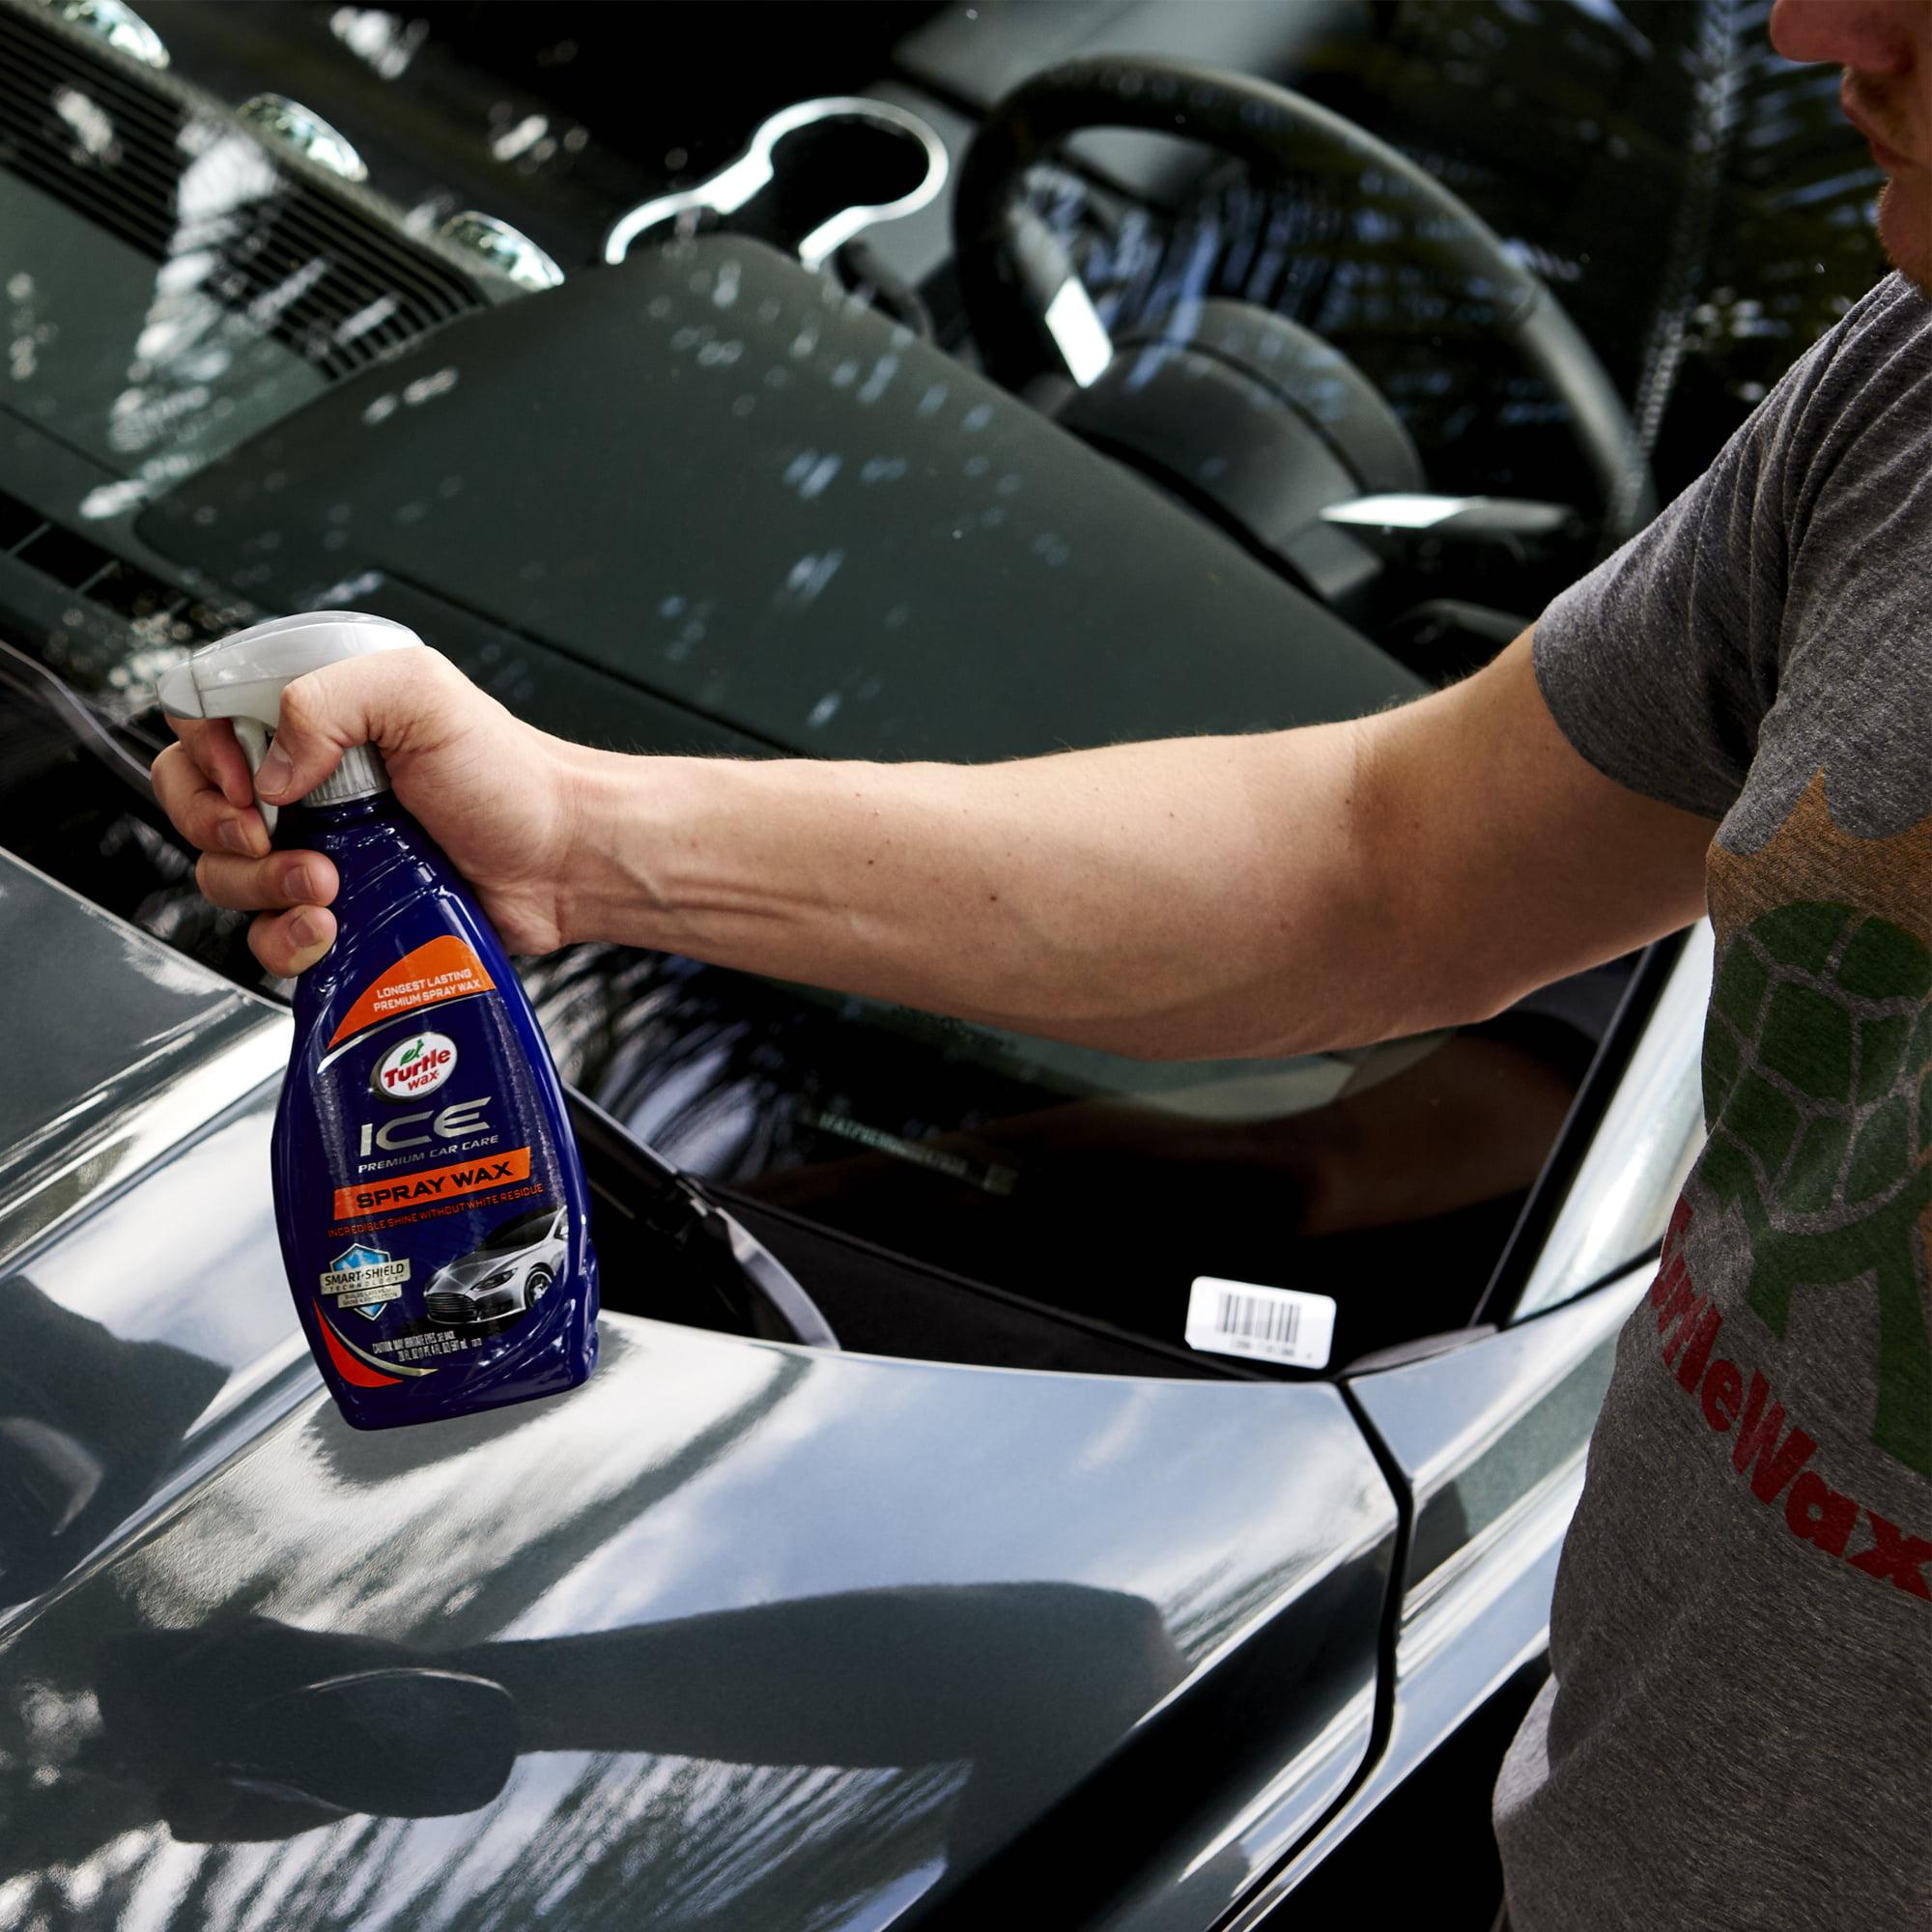 Ice Premium Care Spray Wax 20 Oz